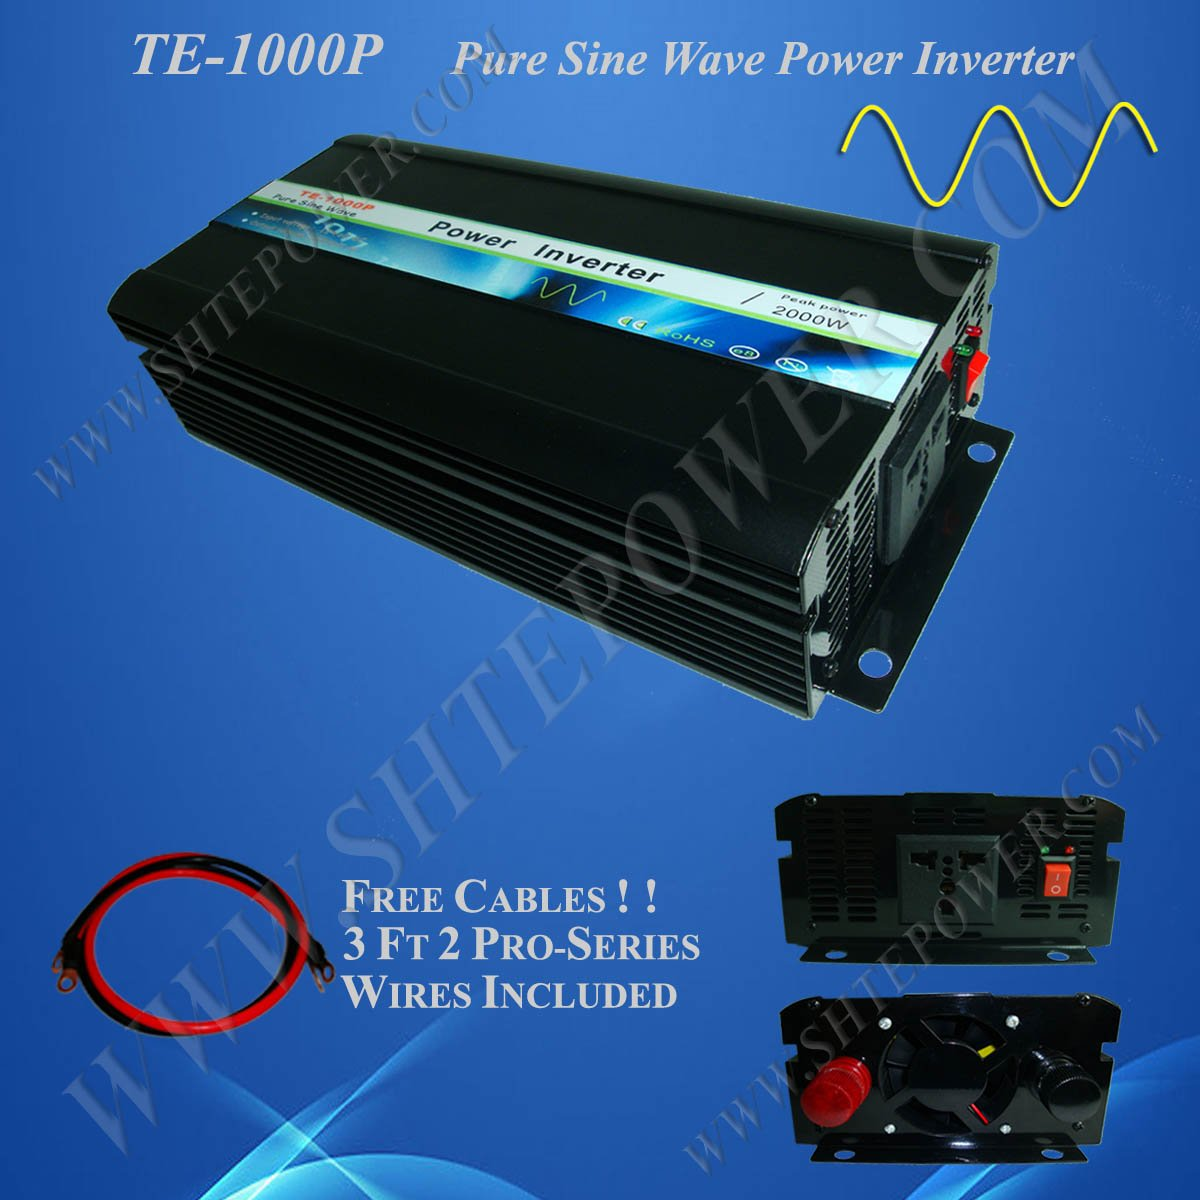 1KW 12V/24VDC to 100V/110V/120V/220V/230V/240VAC Pure Sine Wave Solar/Home Inverter1KW 12V/24VDC to 100V/110V/120V/220V/230V/240VAC Pure Sine Wave Solar/Home Inverter